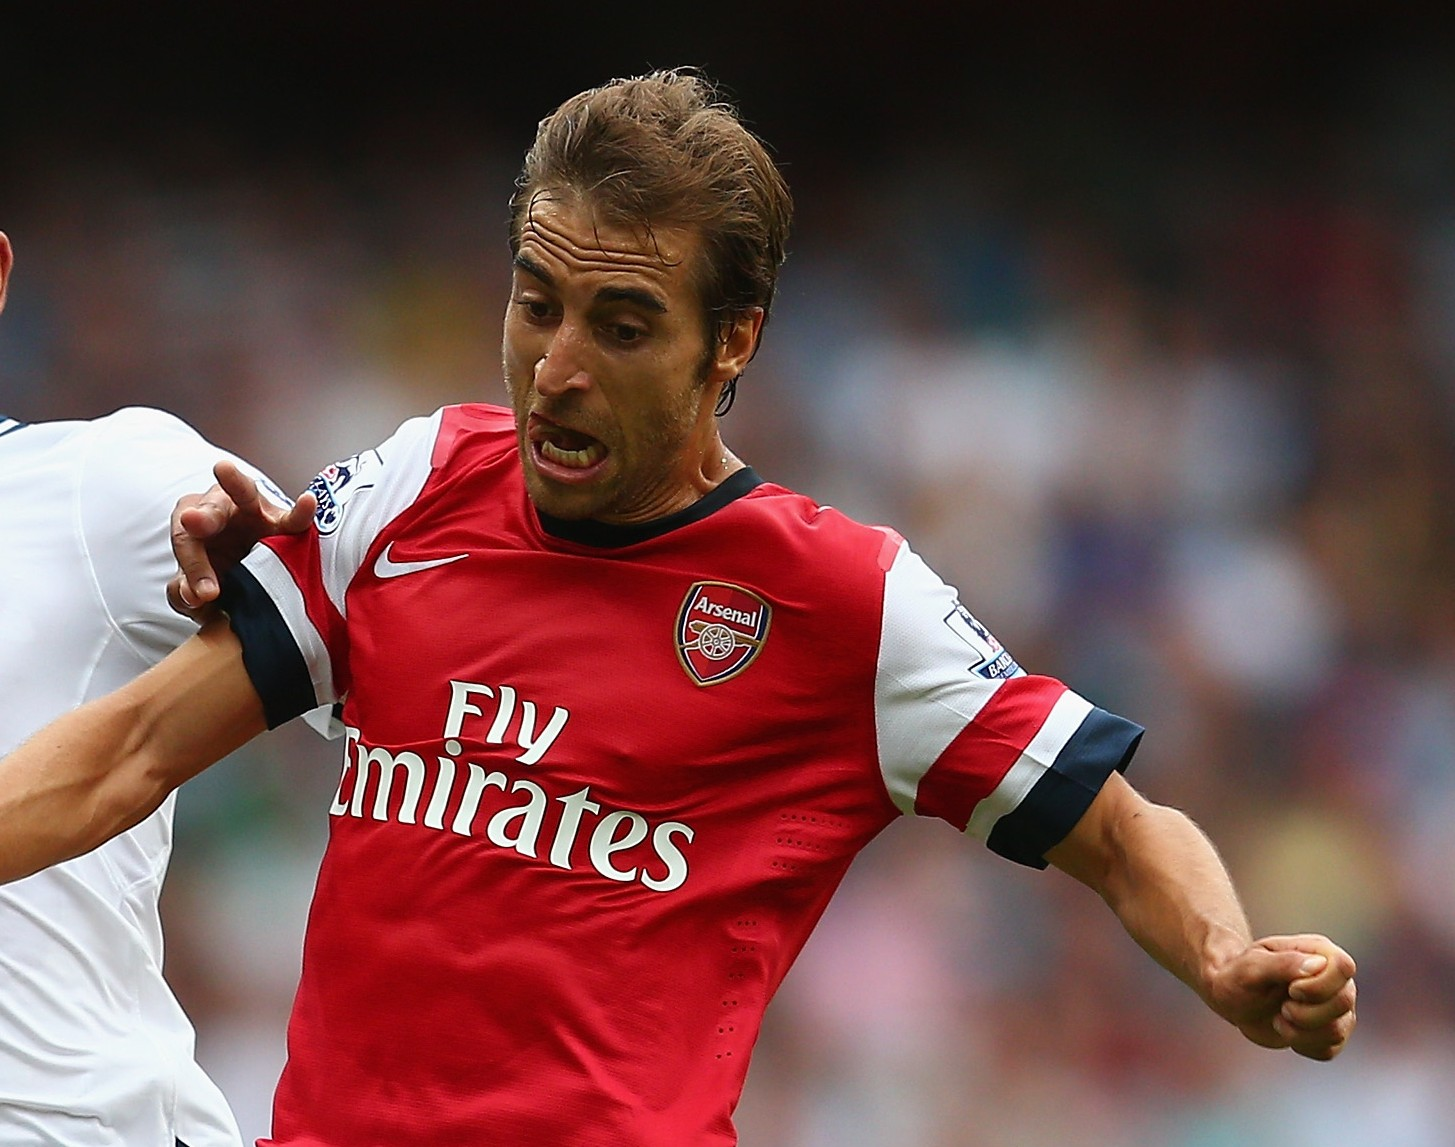 Mathieu Flamini warns Arsenal he wants to finish career at Marseille